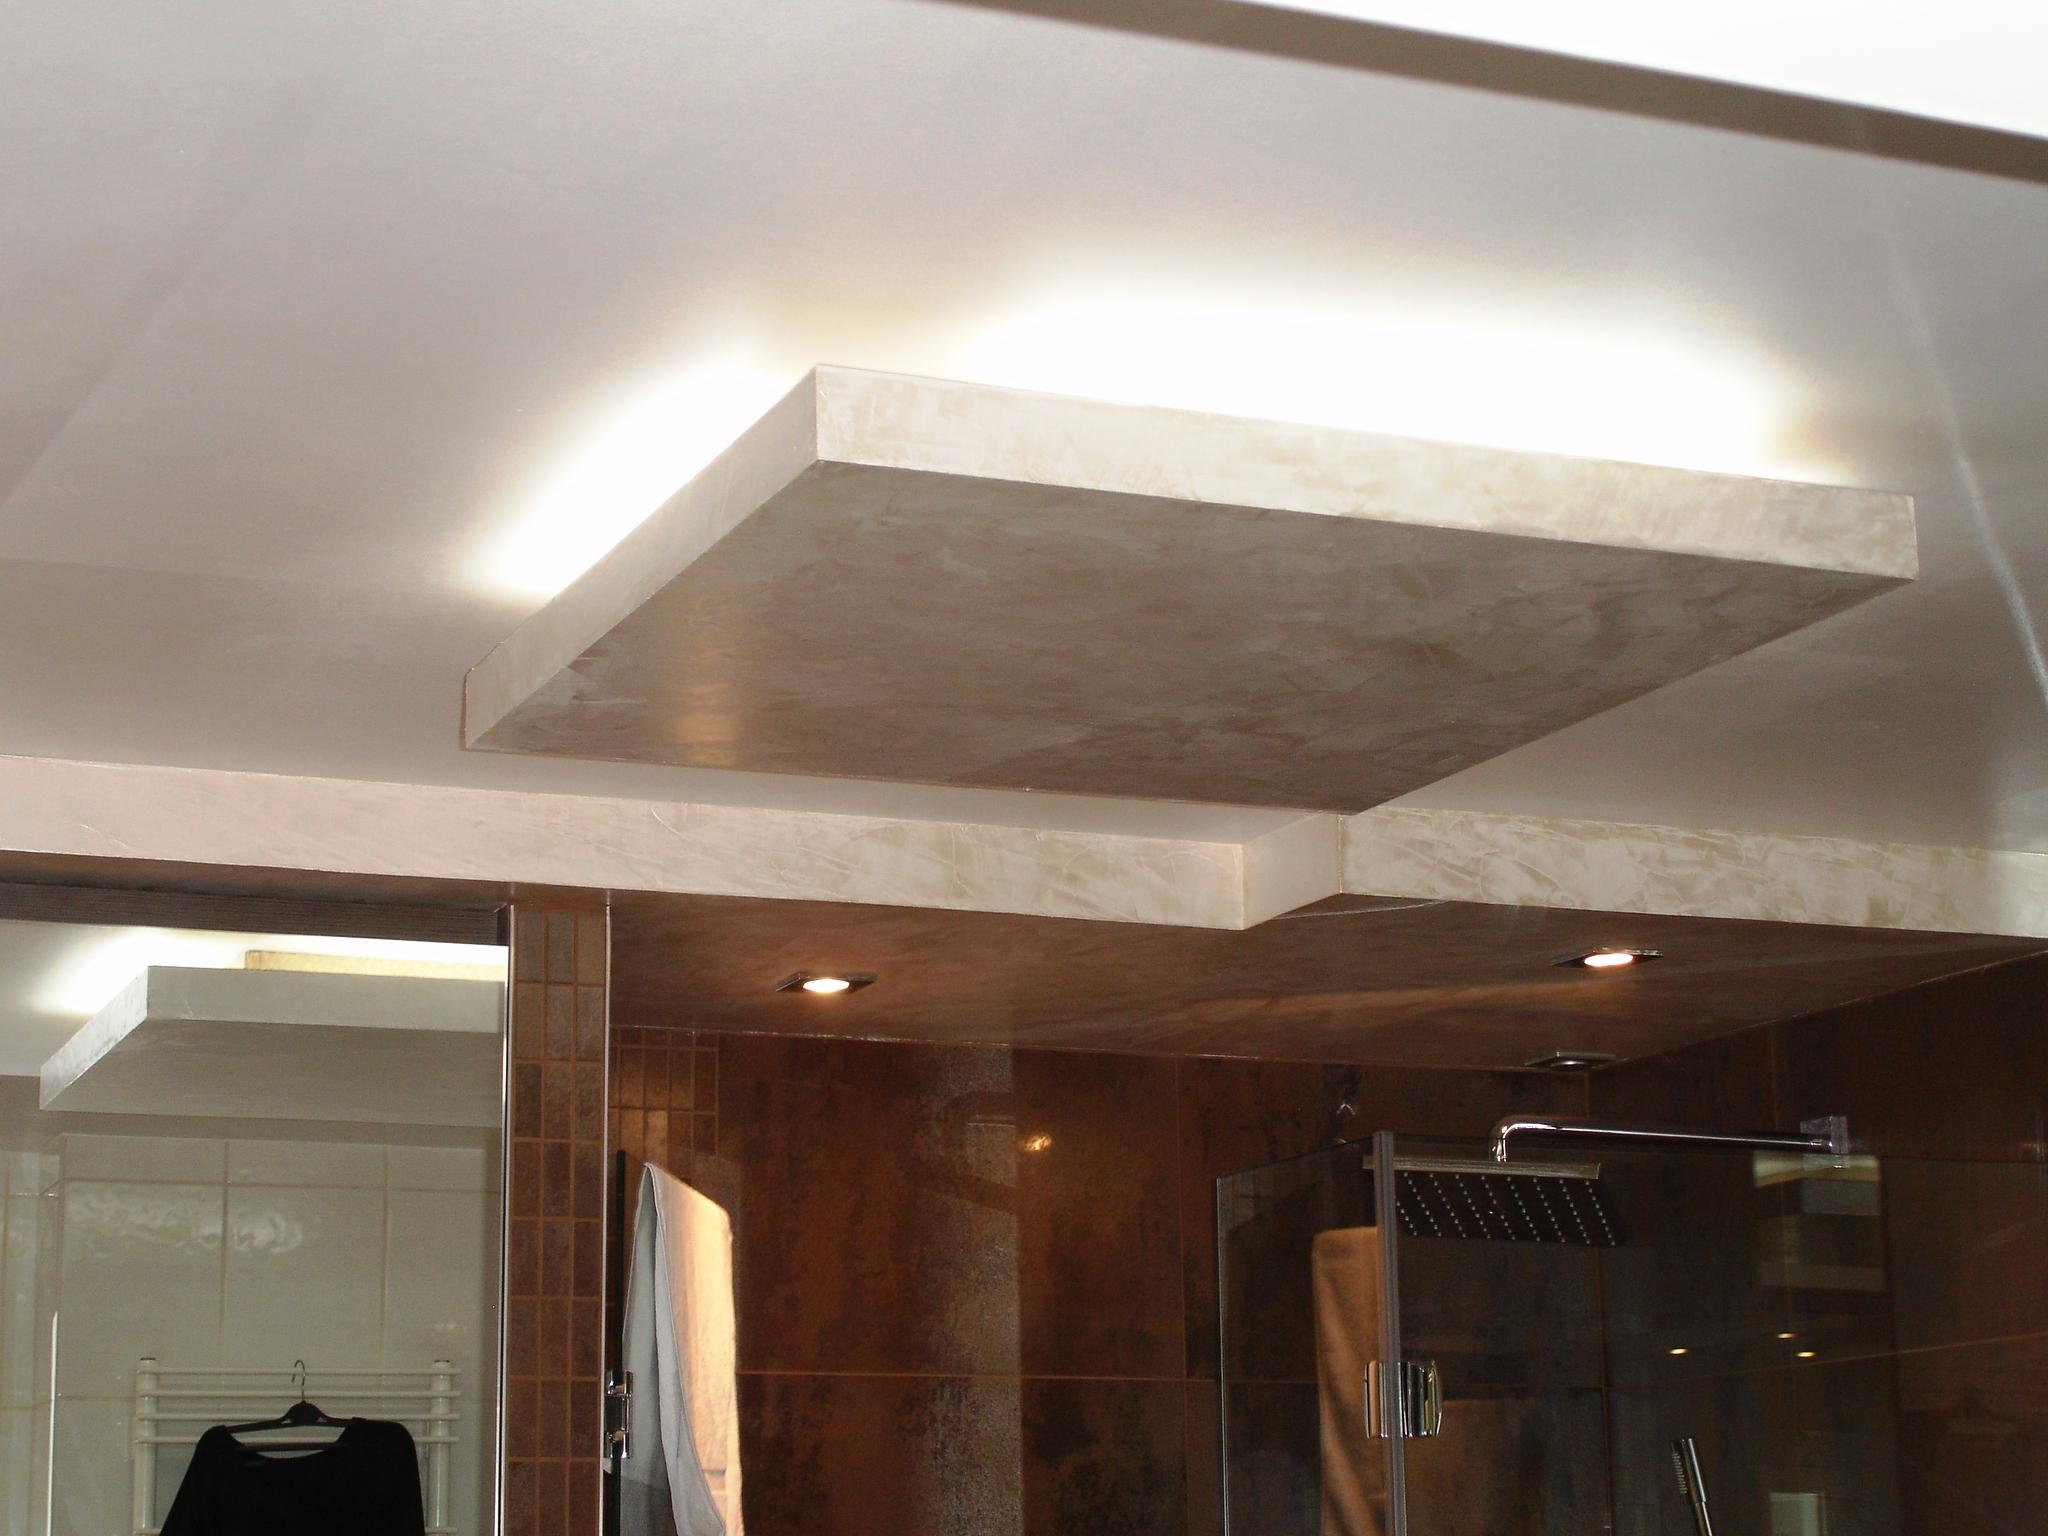 Réaliser un coffre d'éclairage  Illkirch-Graffenstaden 67